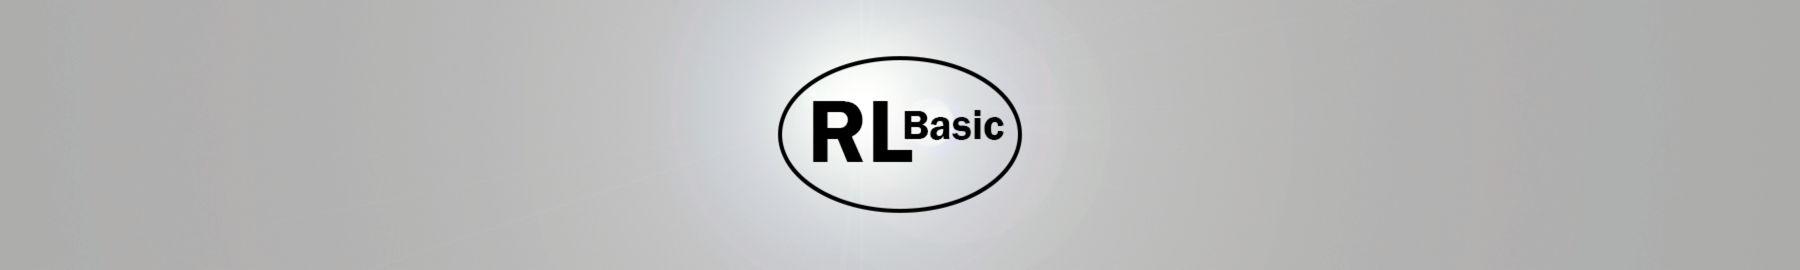 RLBasic